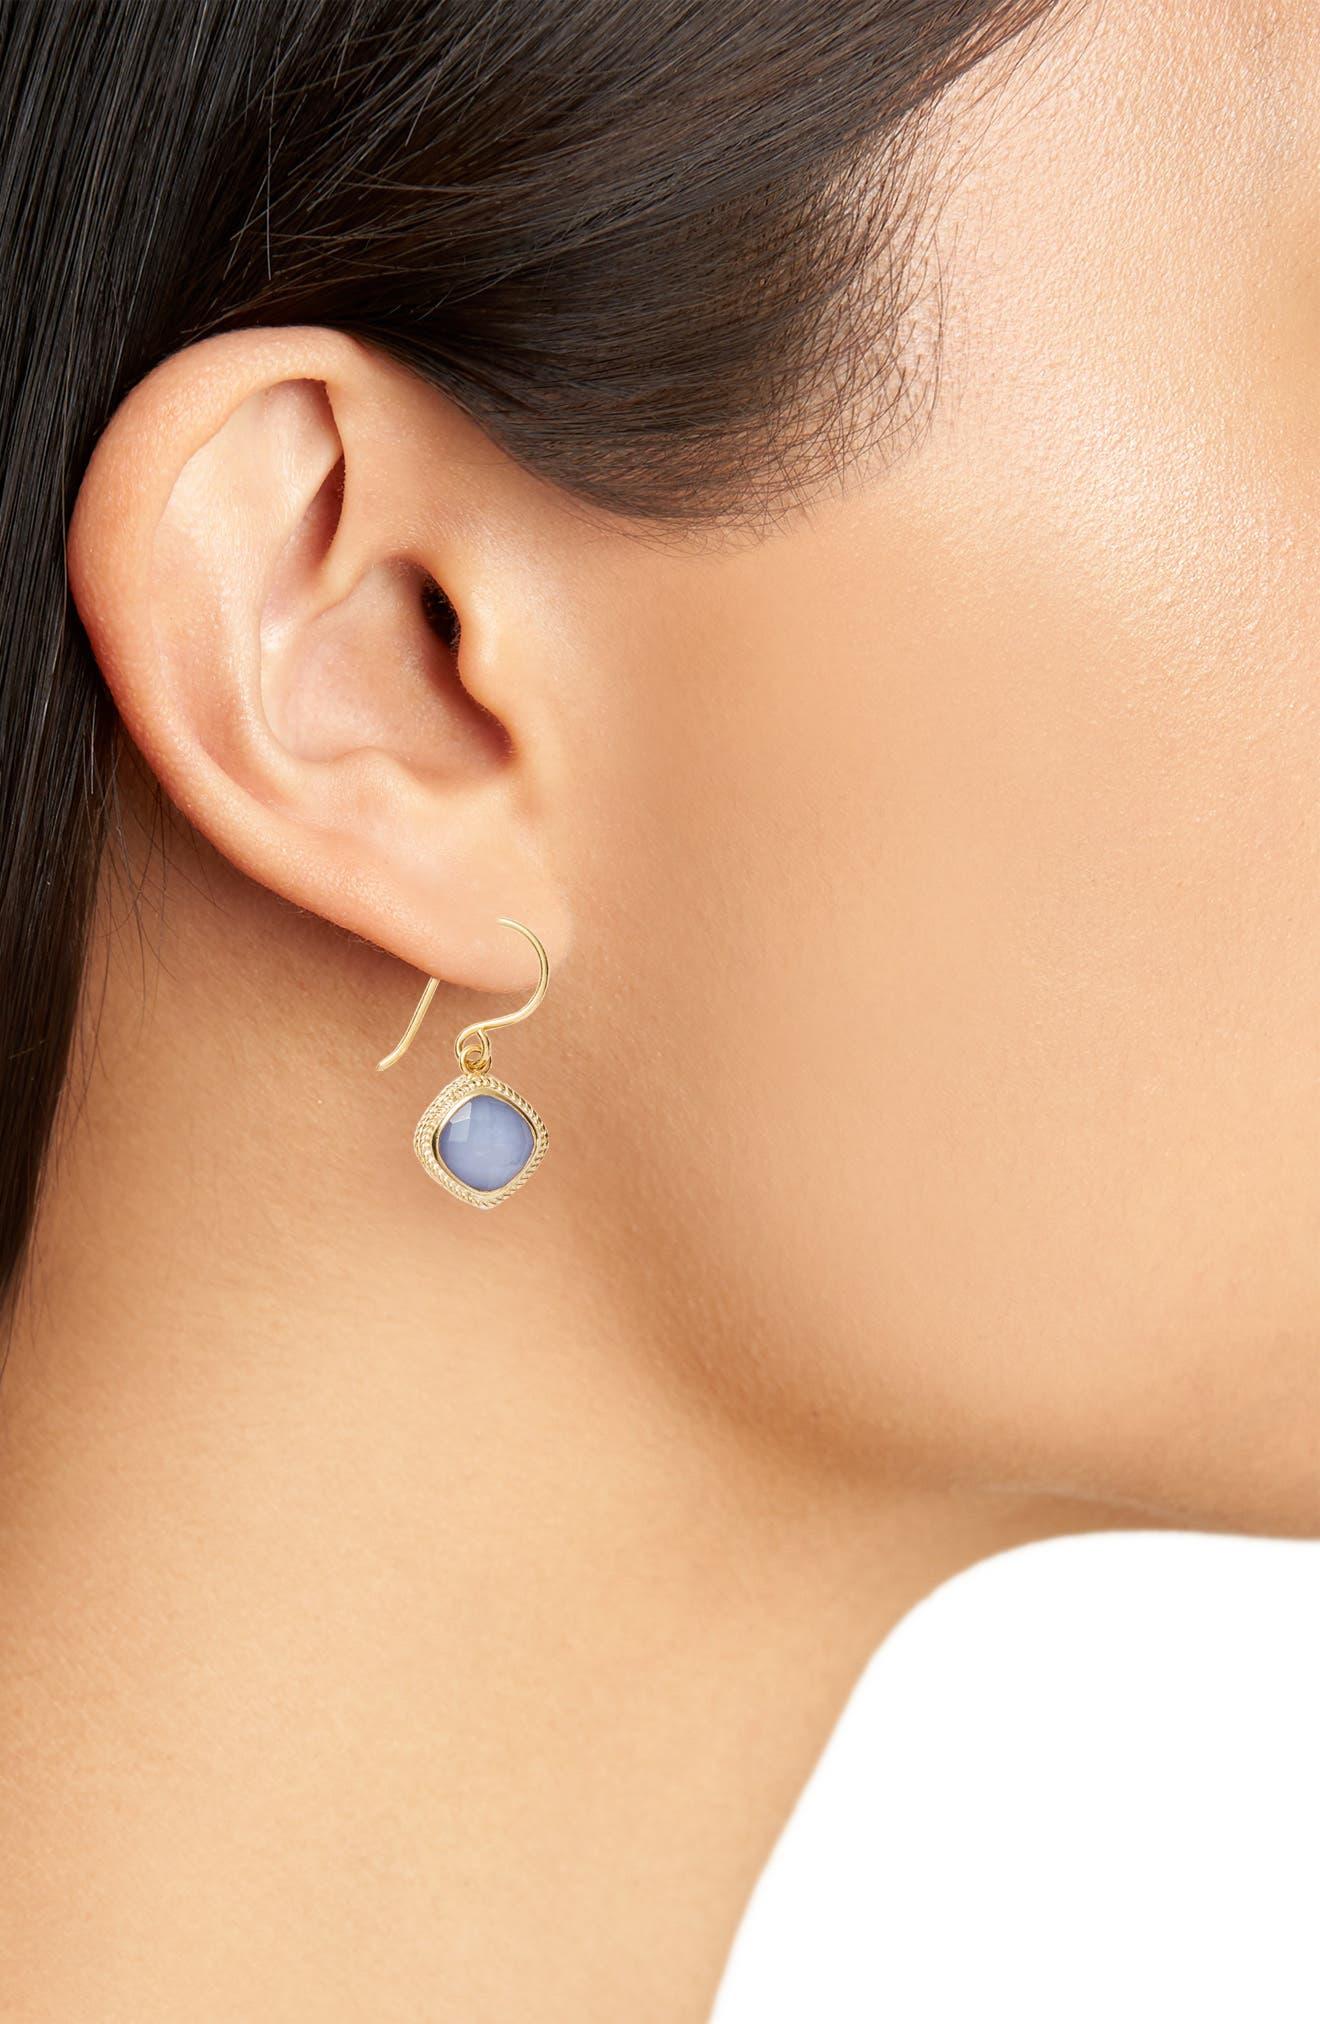 Drop Earrings,                             Alternate thumbnail 2, color,                             400